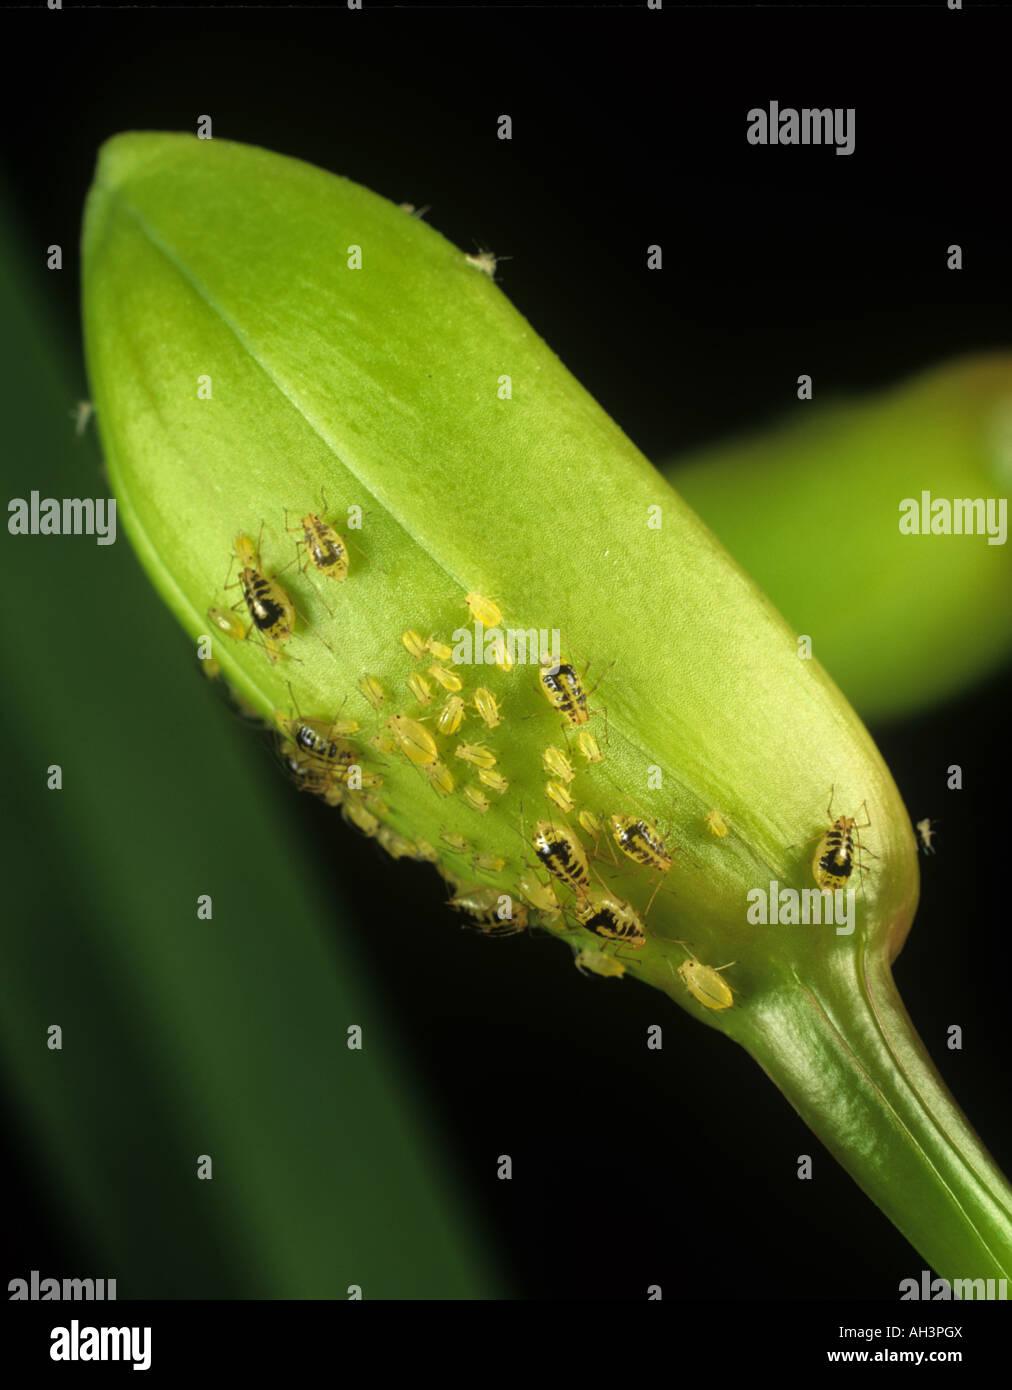 Mottled arum aphid Aulacorthum circumflexum infestation on an orchid flower bud - Stock Image